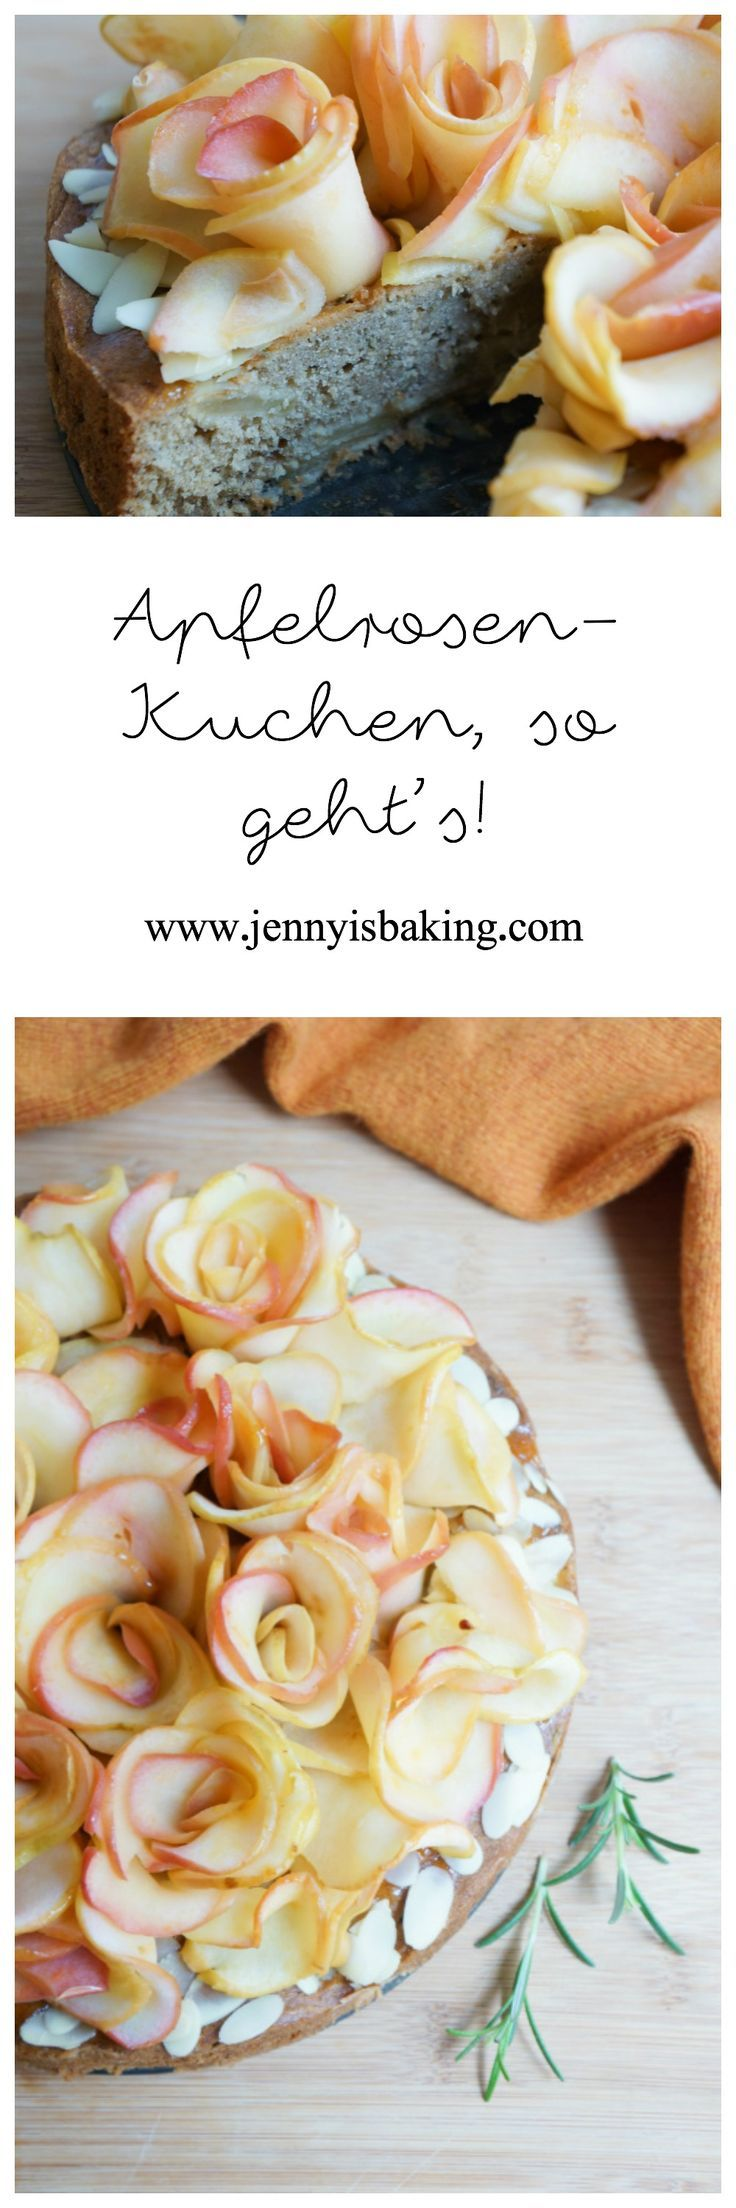 Apfelrosen-Kuchen - Jenny is baking